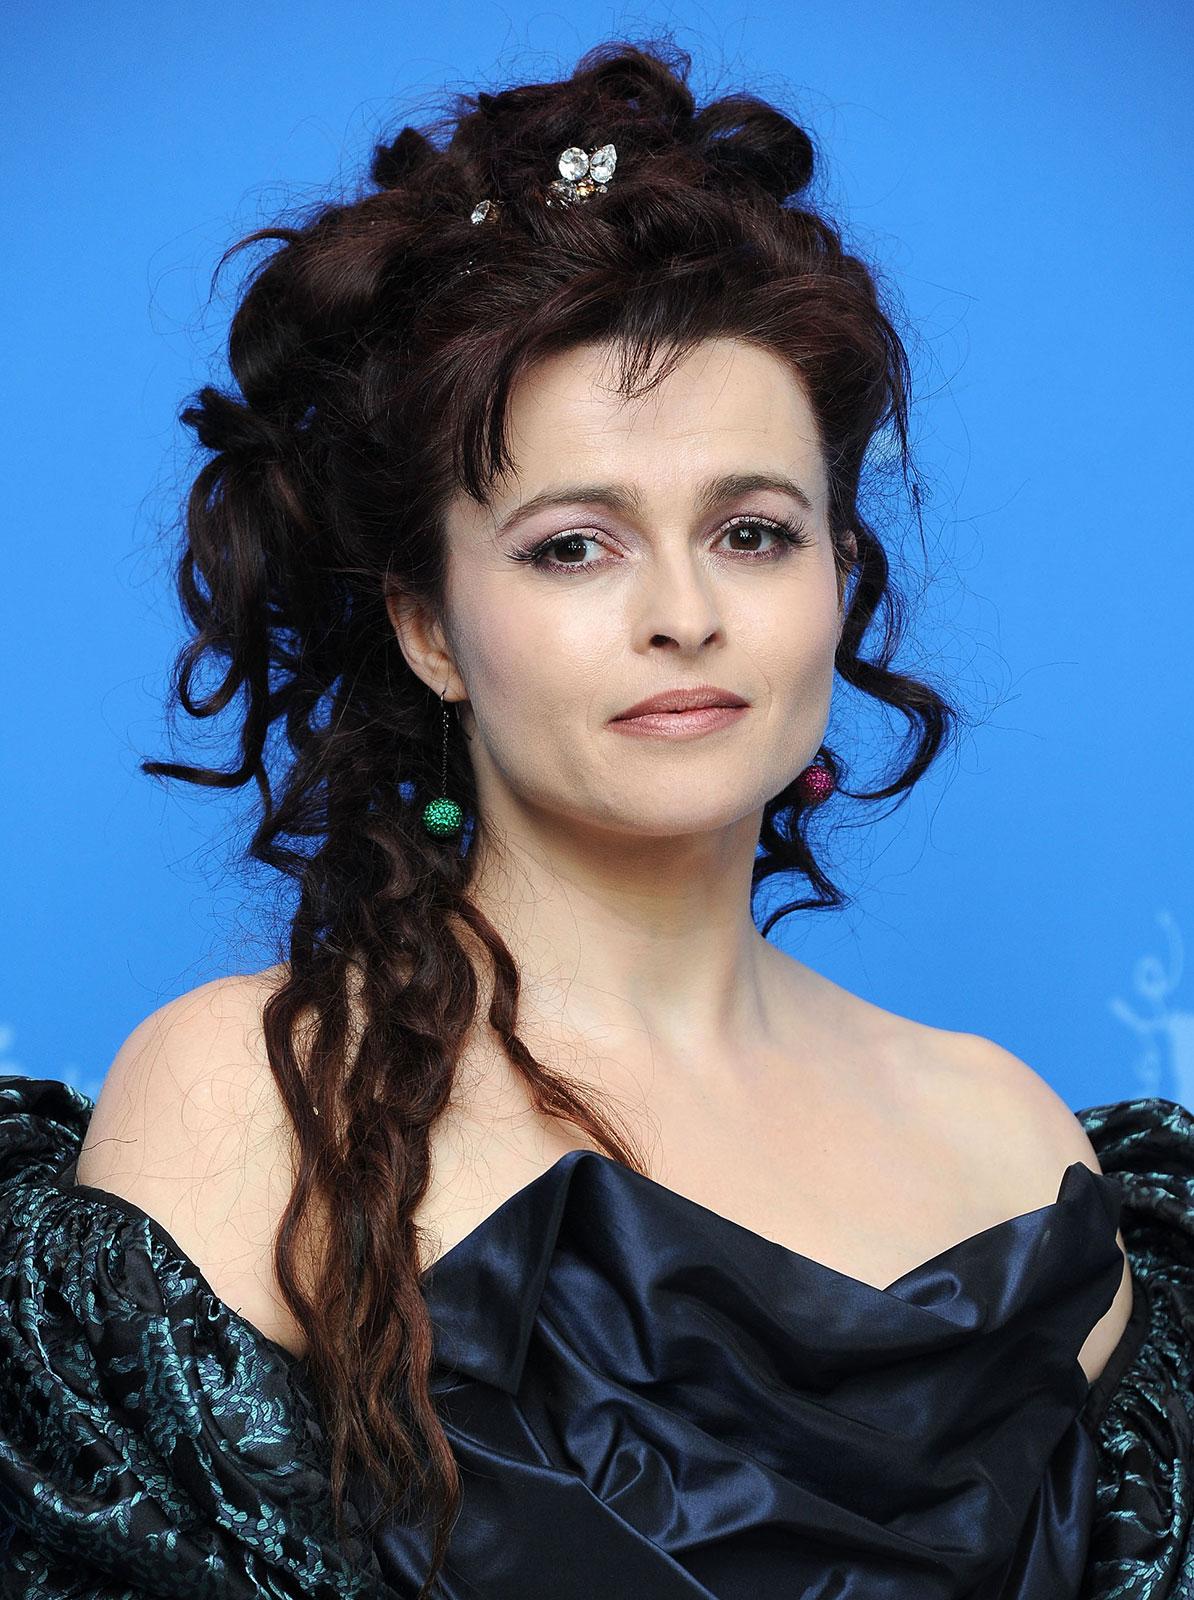 Bestand:Helena Bonham Carter.jpg